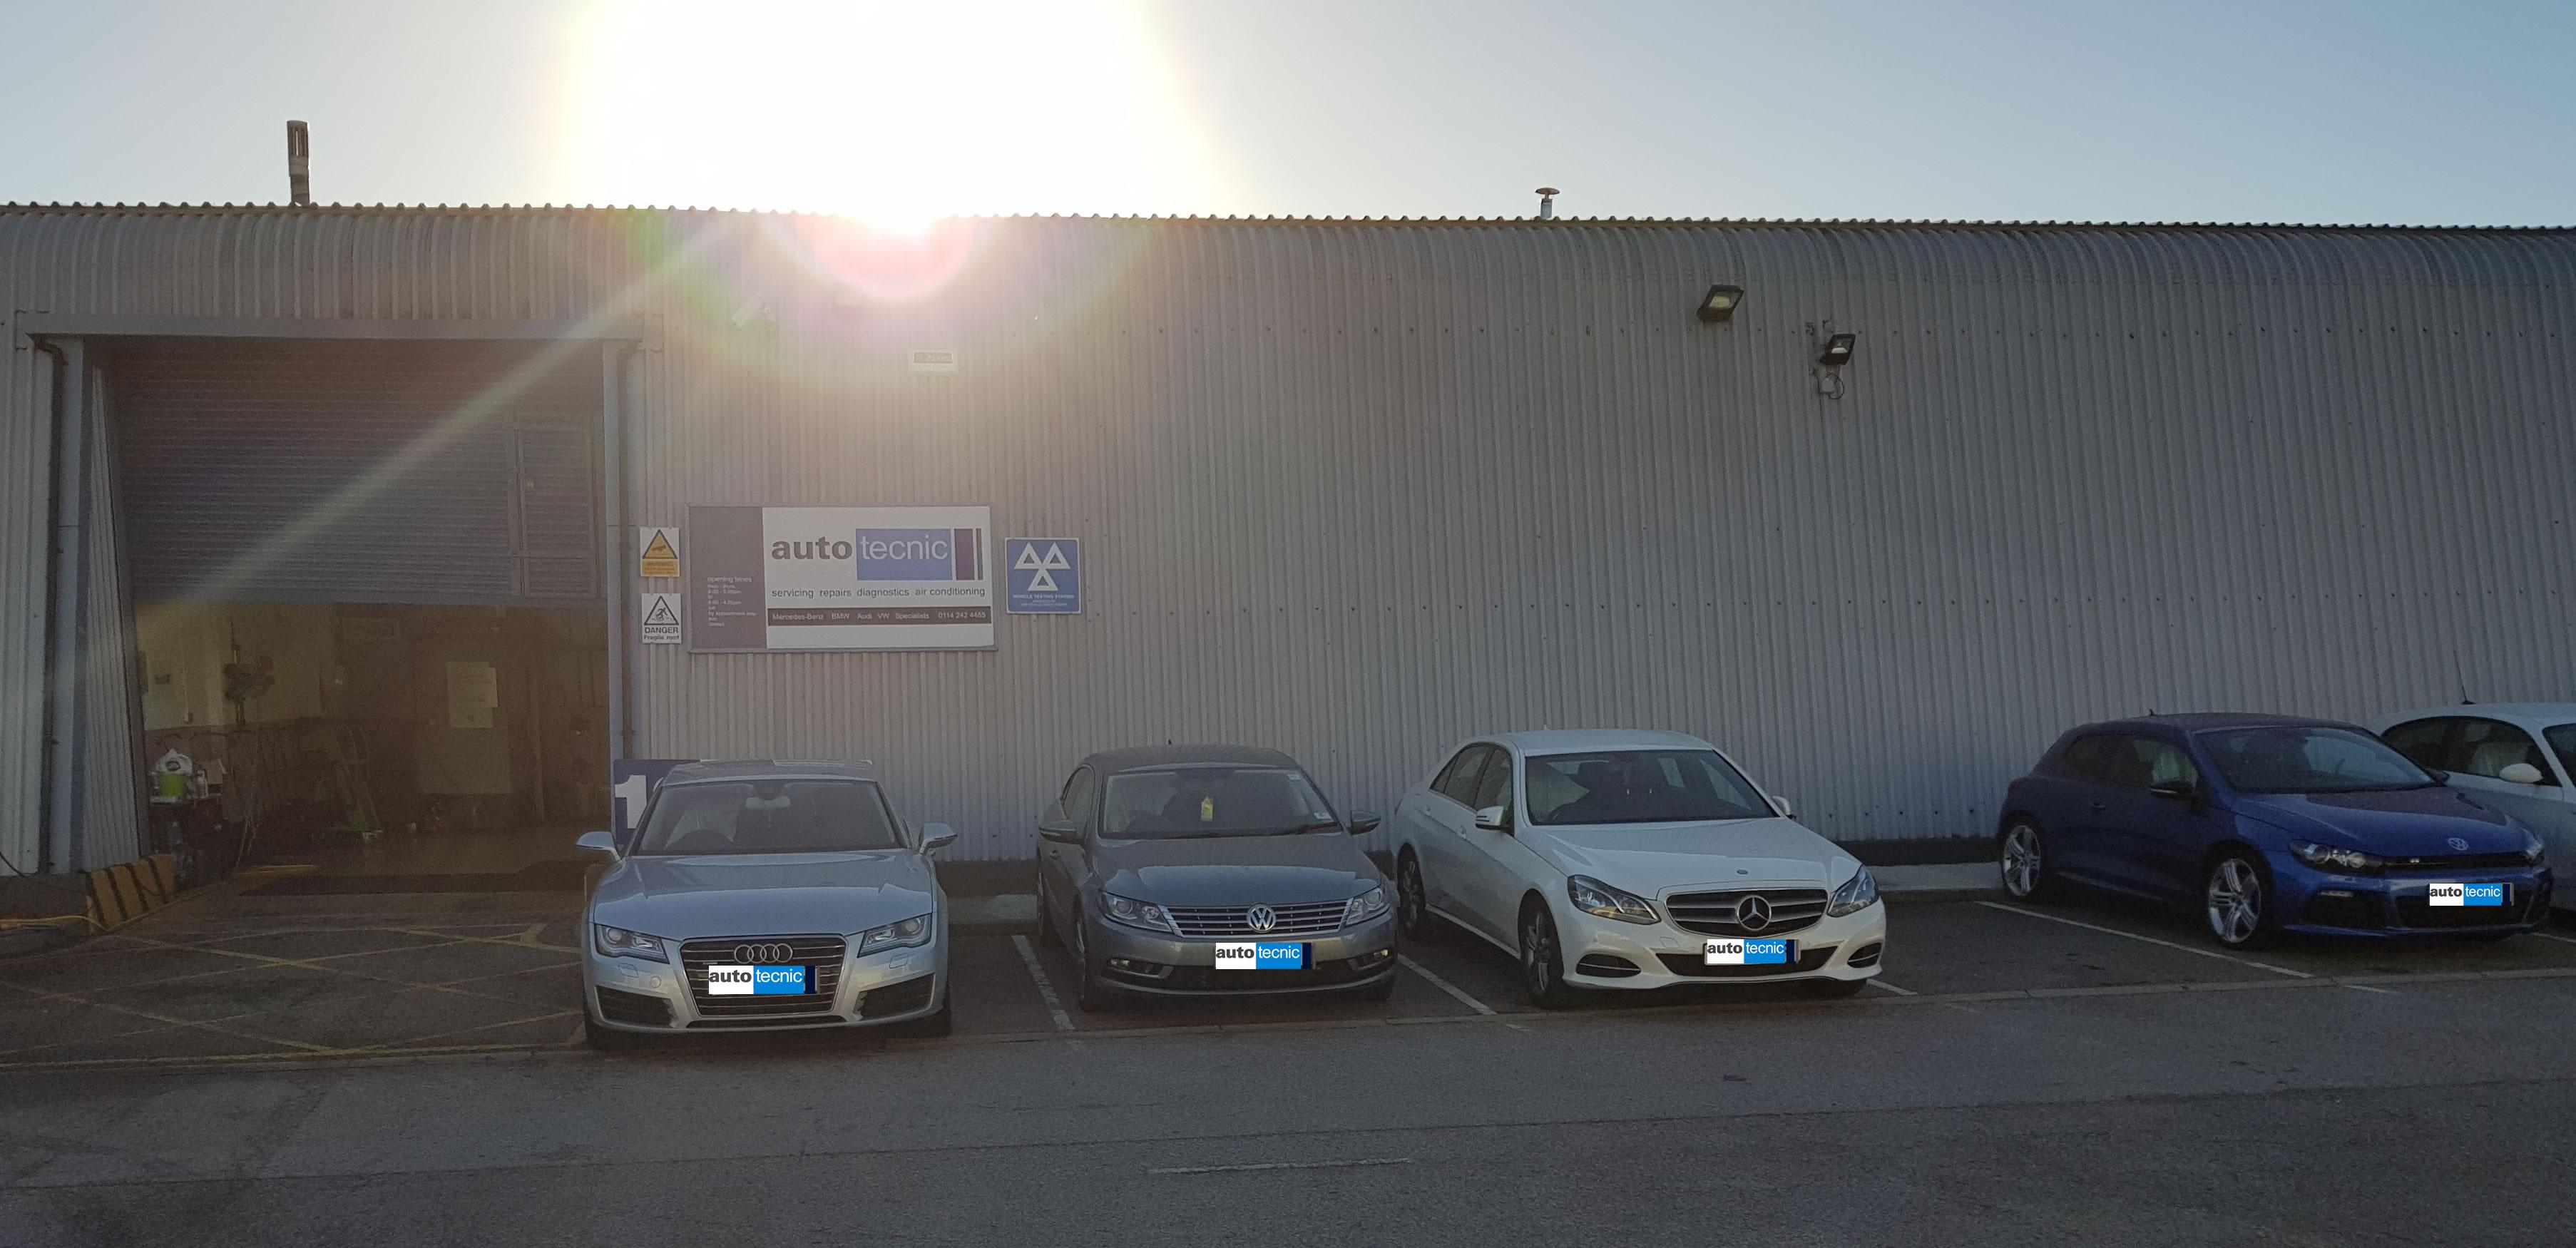 autotecnic - Garage - Audi - VW - Merecedes